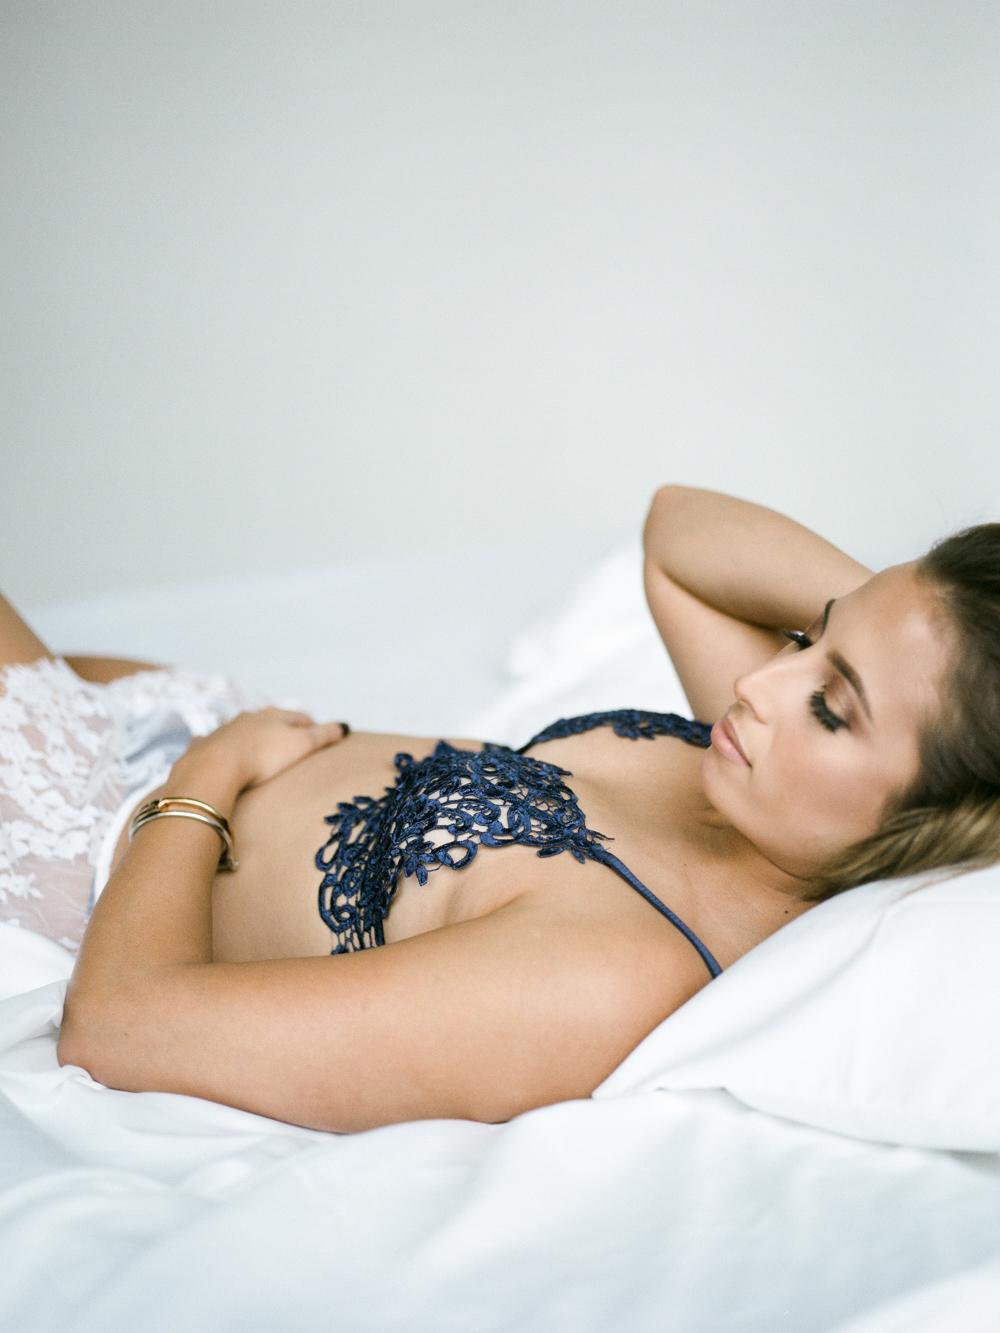 Christine-Gosch-Houston-boudoir-photographer-film-photography-fill-in-the-blank-wedding-photographer-10.jpg